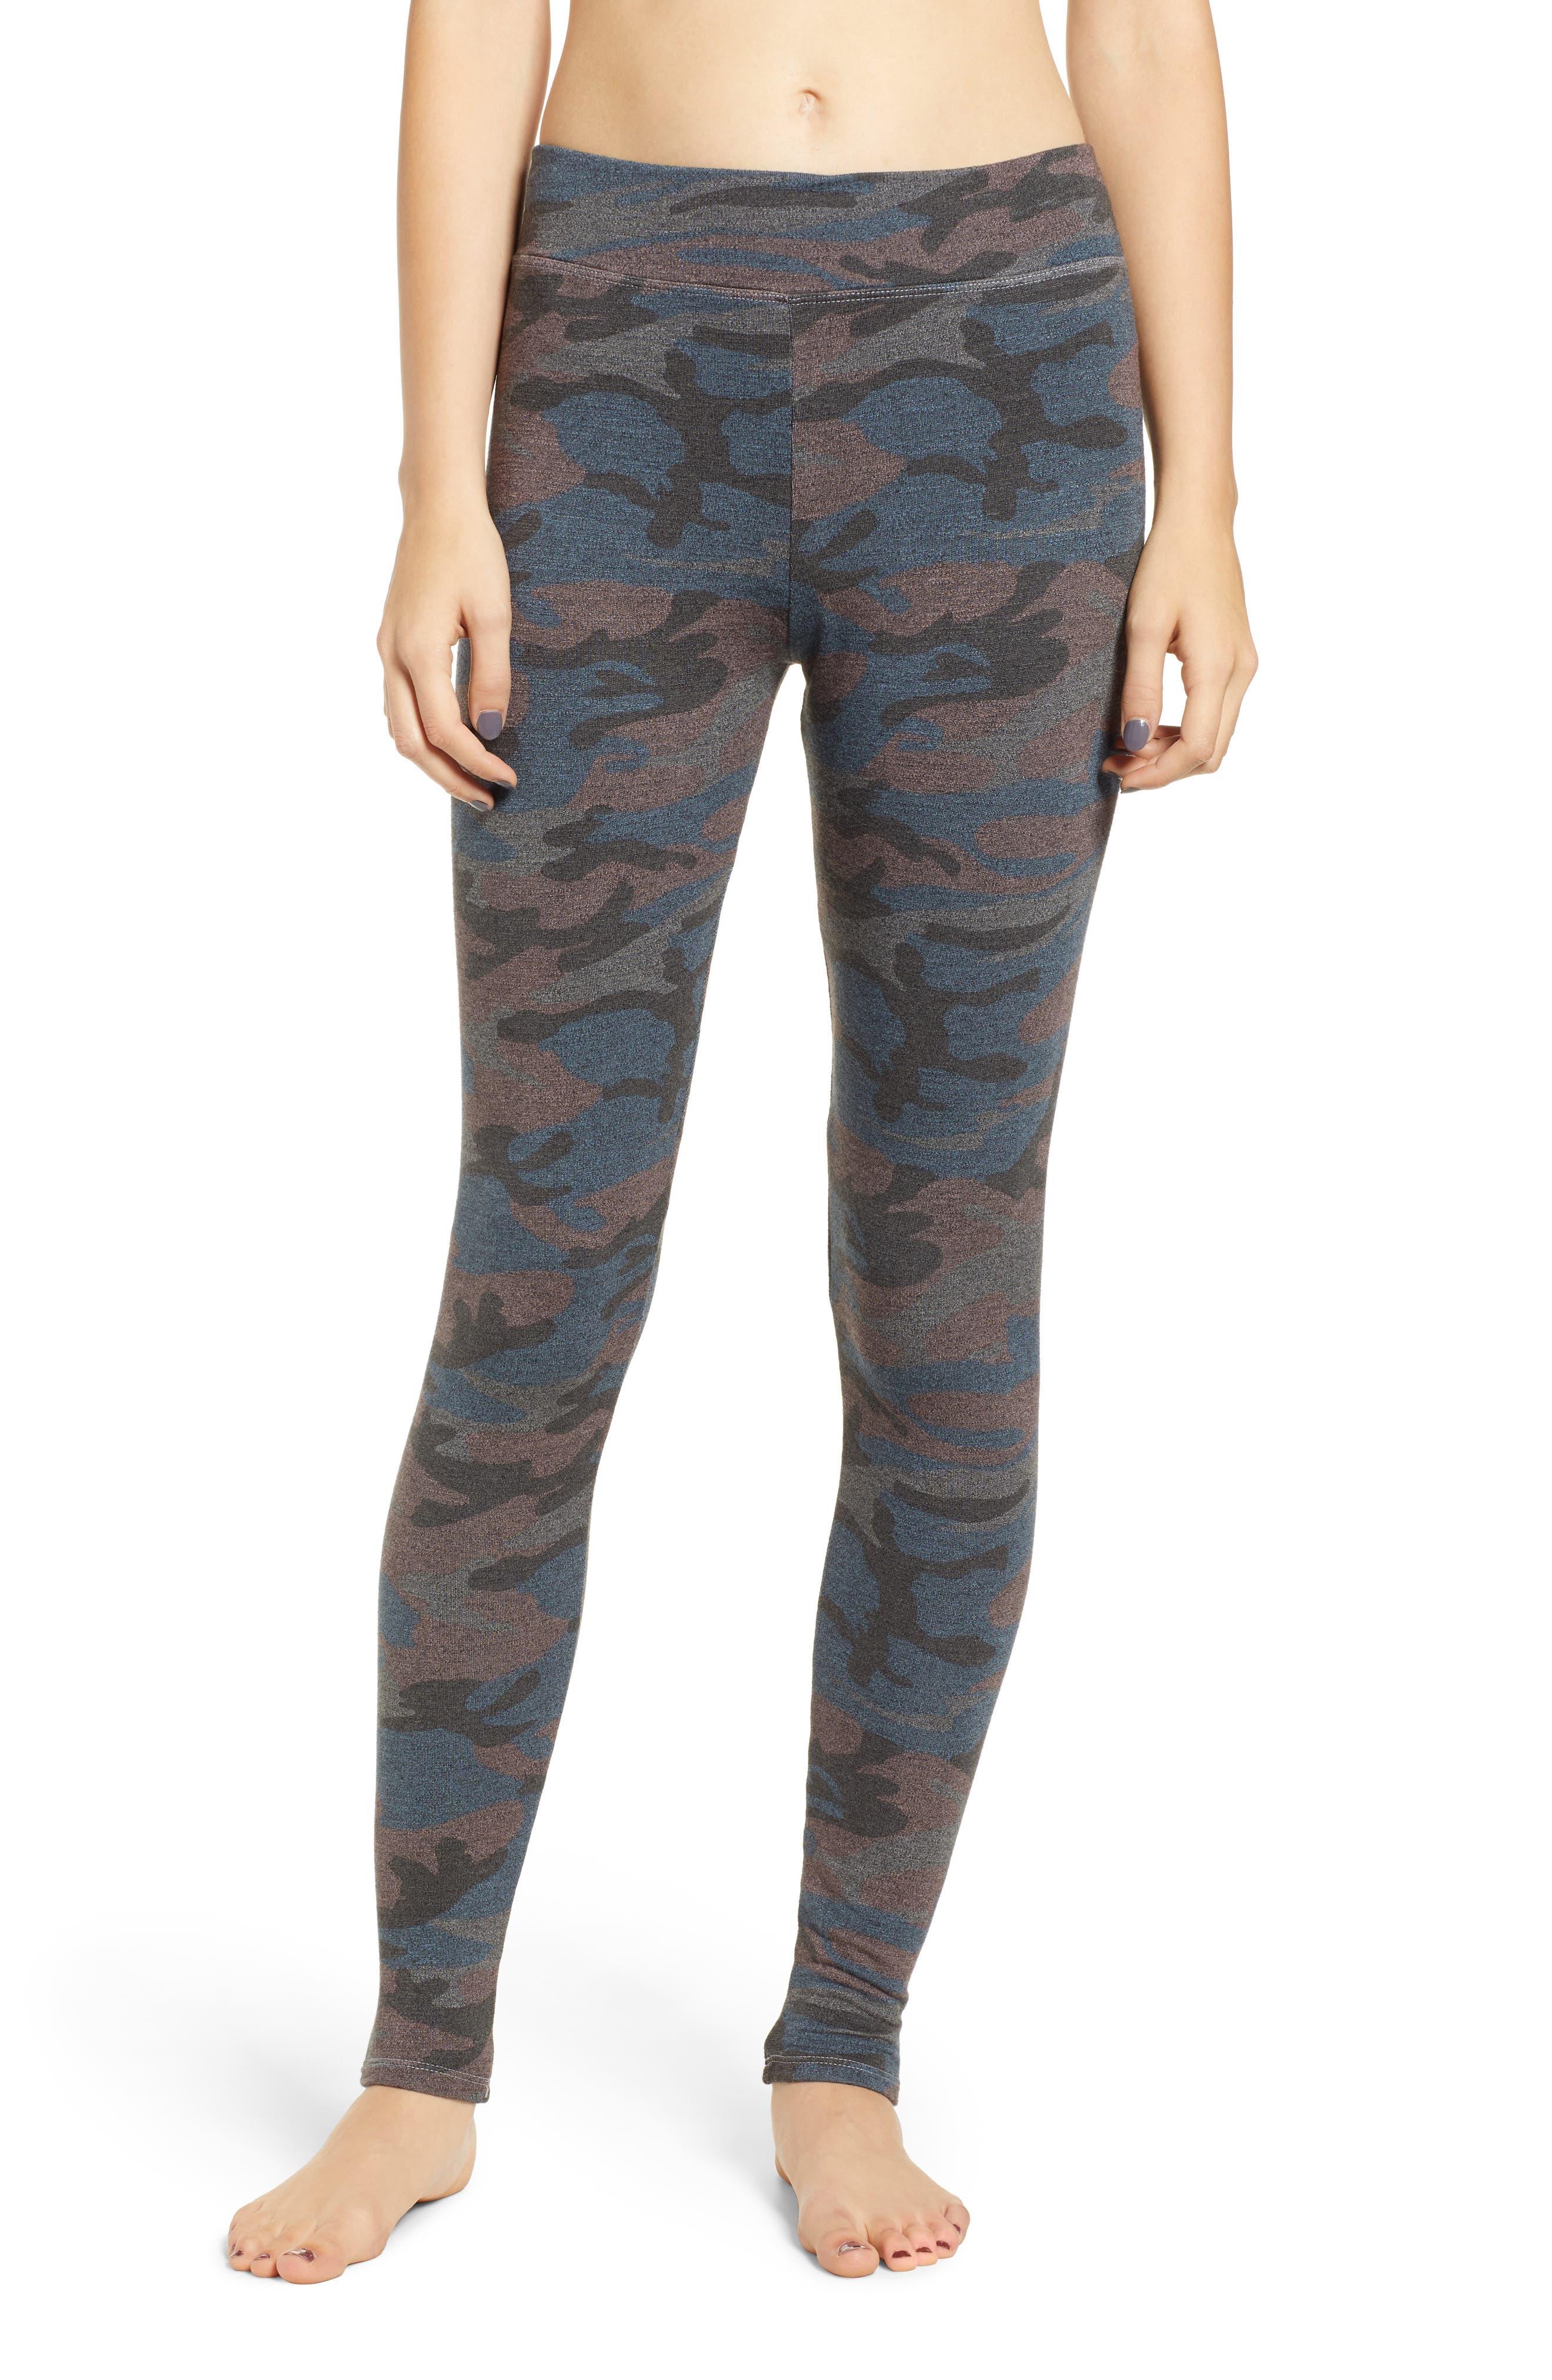 SUNDRY,                             Camo Yoga Pants,                             Main thumbnail 1, color,                             020